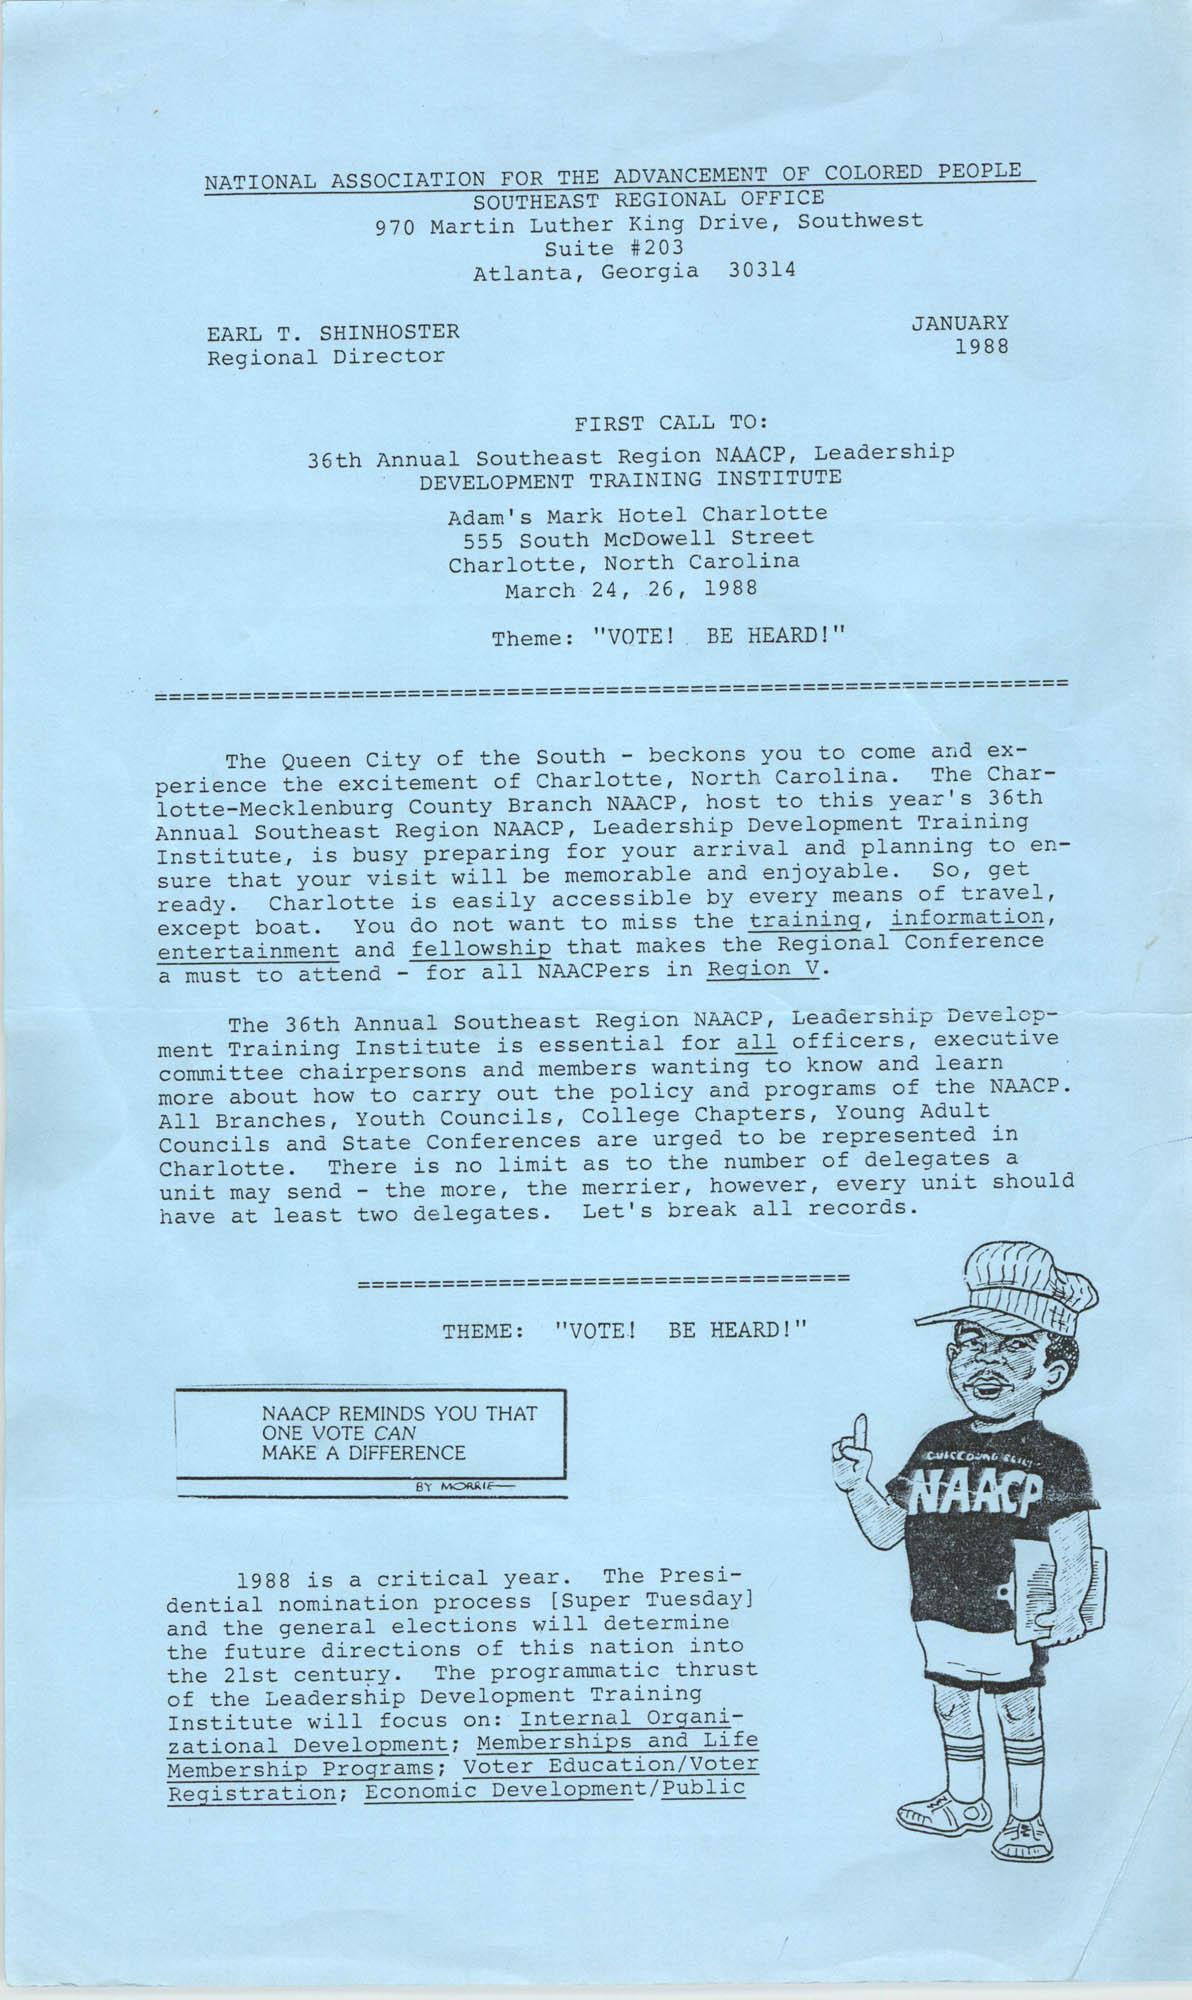 NAACP Southeast Regional Office Newsletter, January 1988